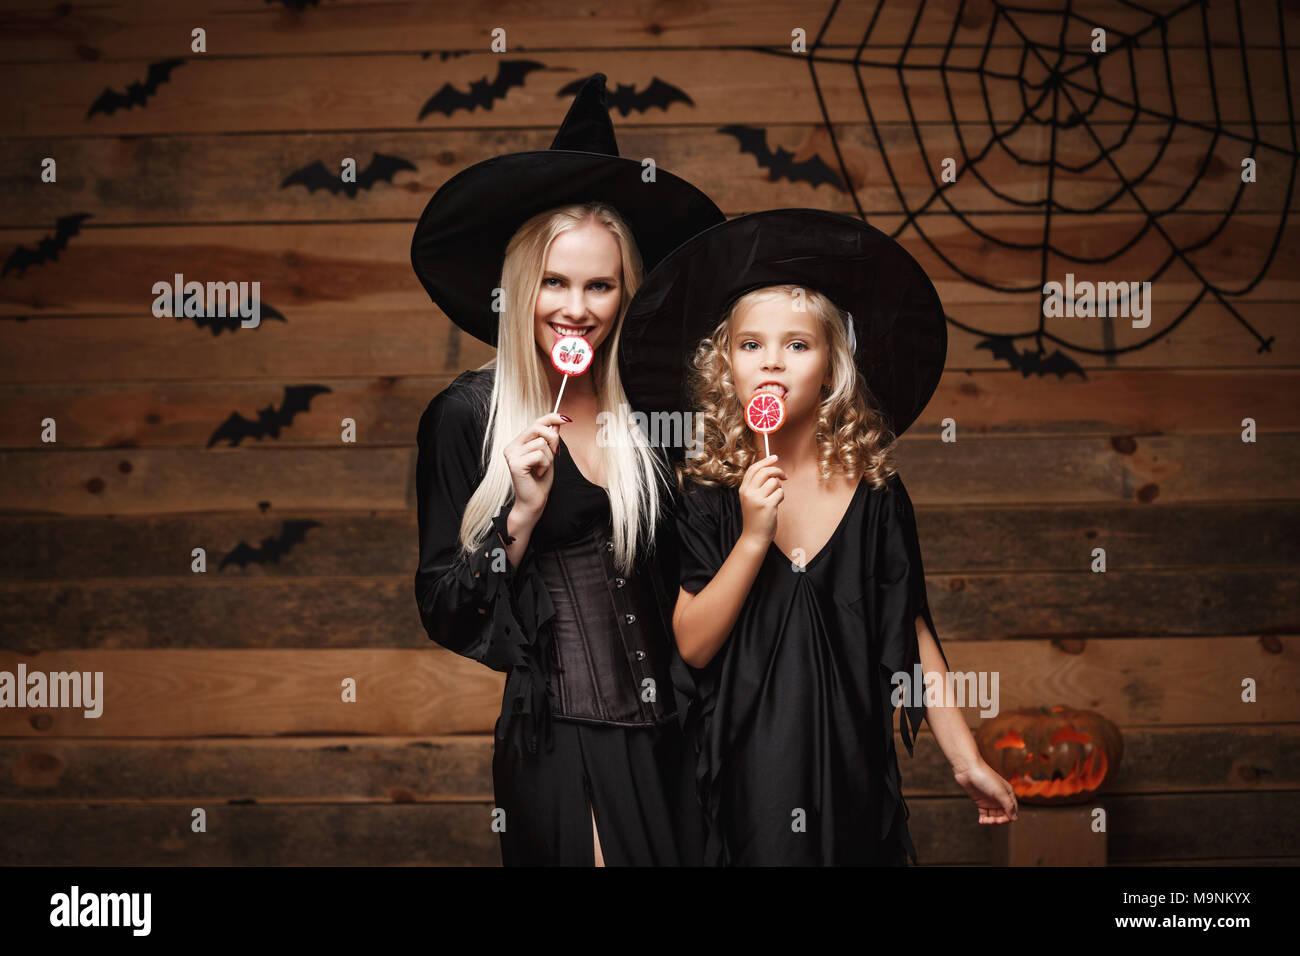 Halloween Sweet Candy Stockfotos & Halloween Sweet Candy Bilder - Alamy